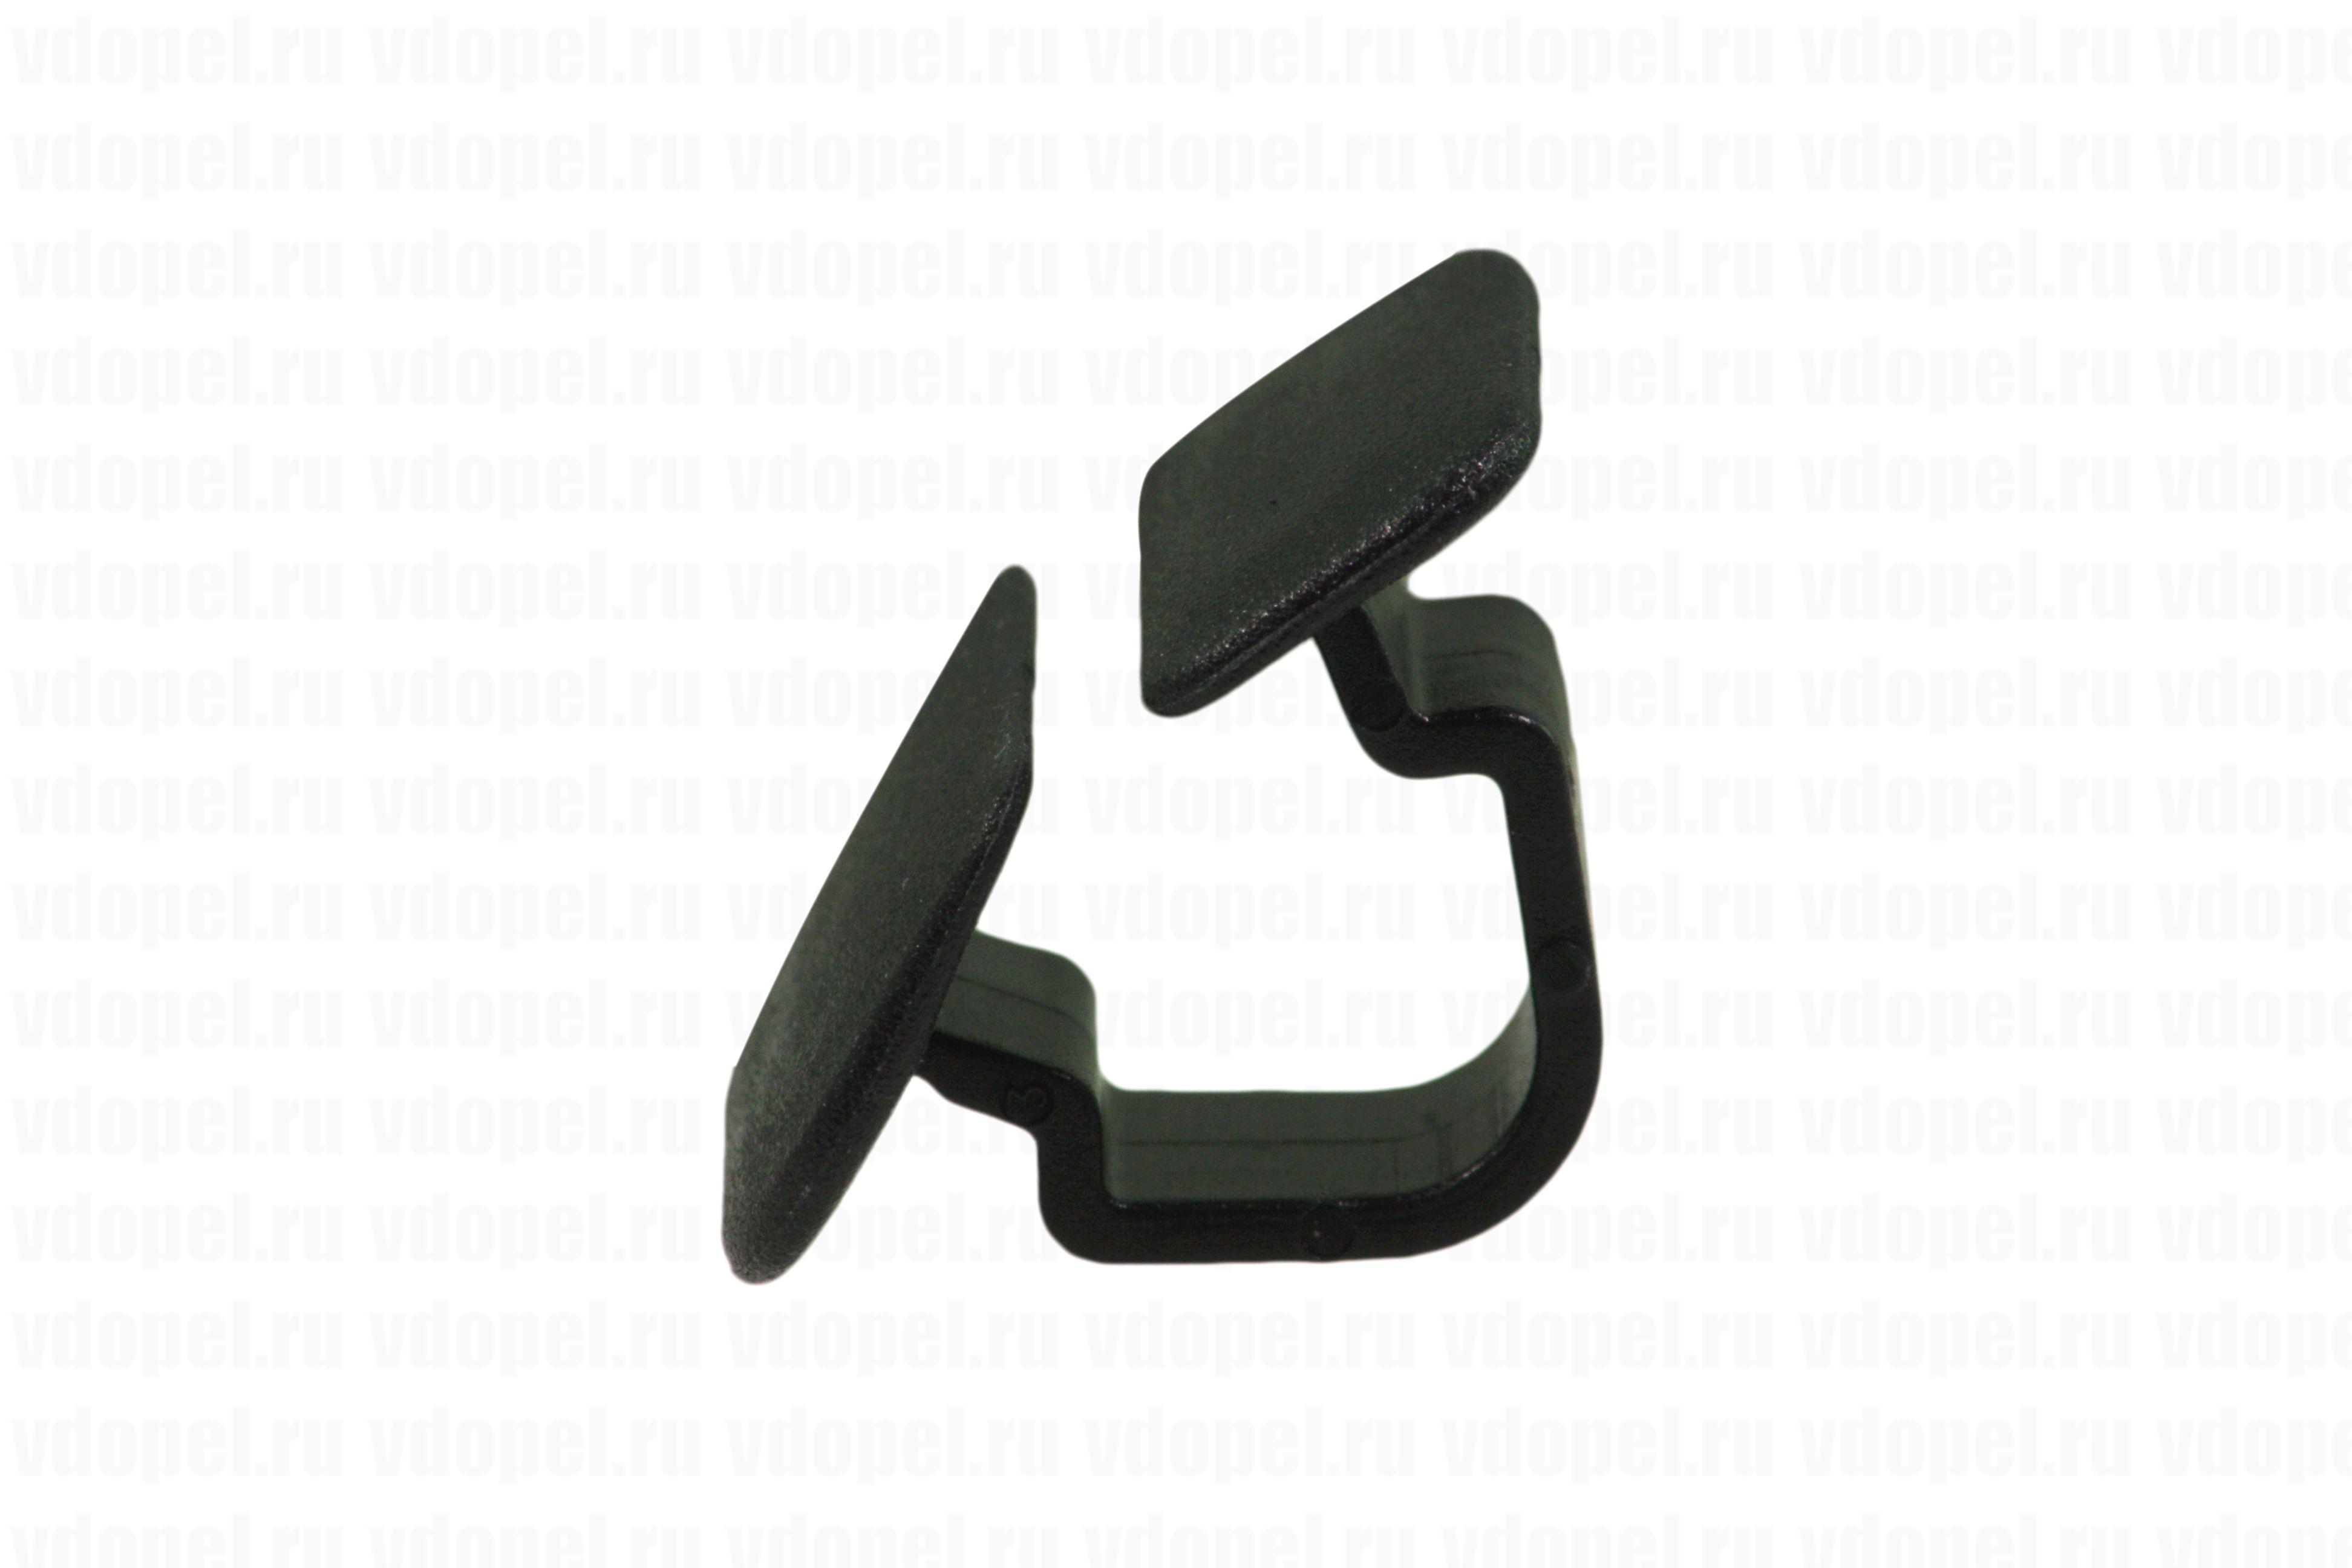 GM 90559149  - Зажим крышки приборного щитка нижний. Зафира